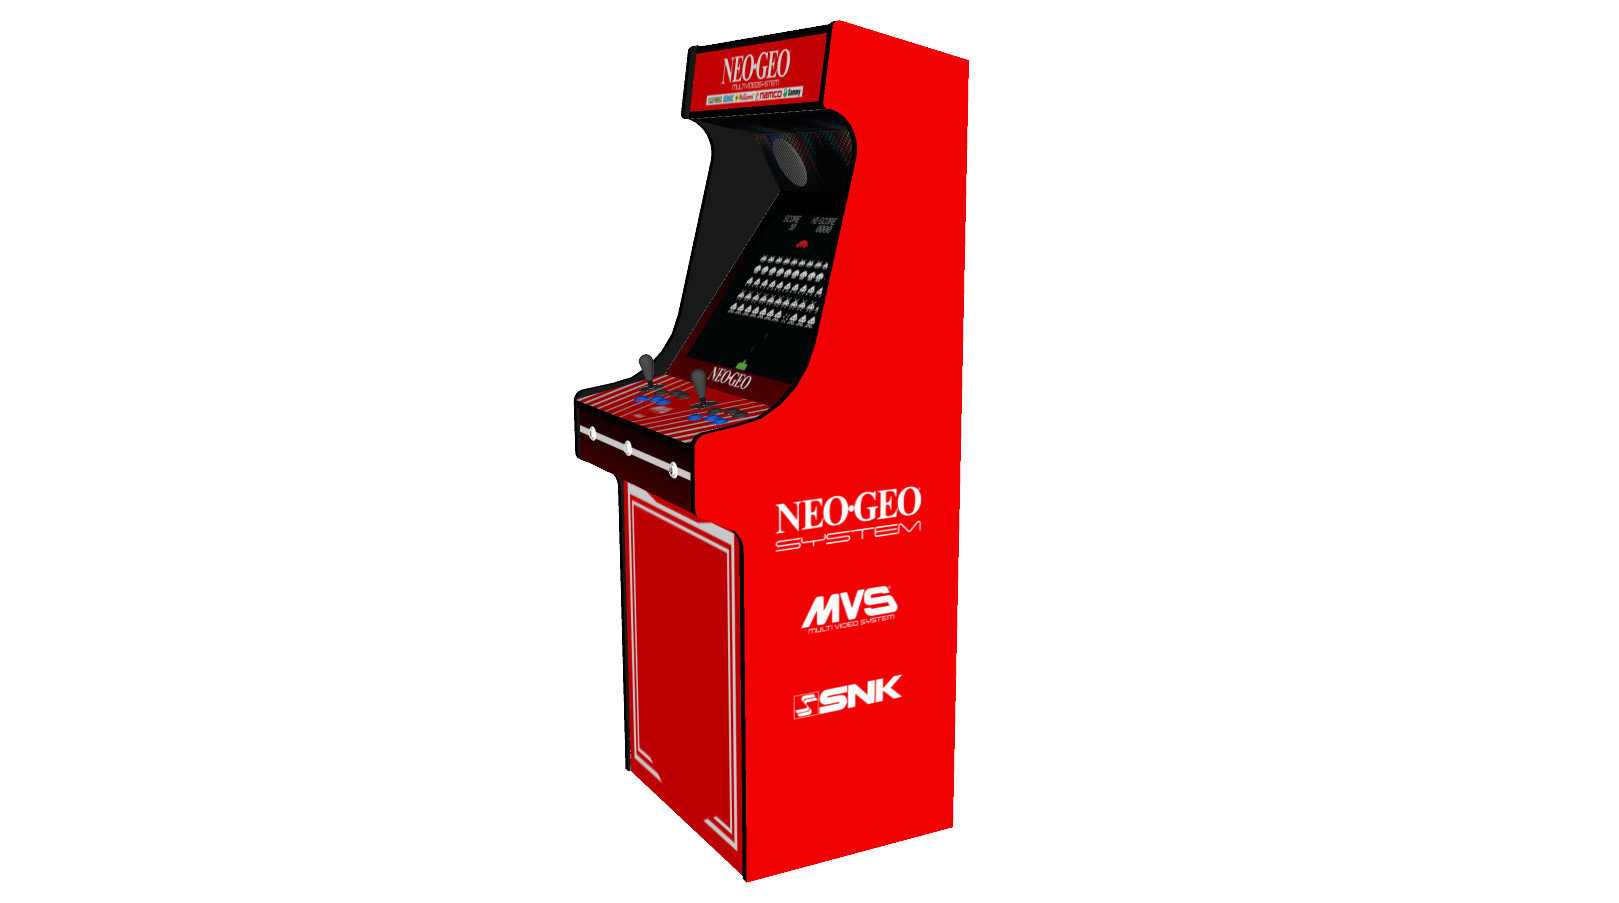 Classic-Upright-Arcade-Machine-NEO-GEO-Theme-100w-subwoofer-24-inch-screen-right